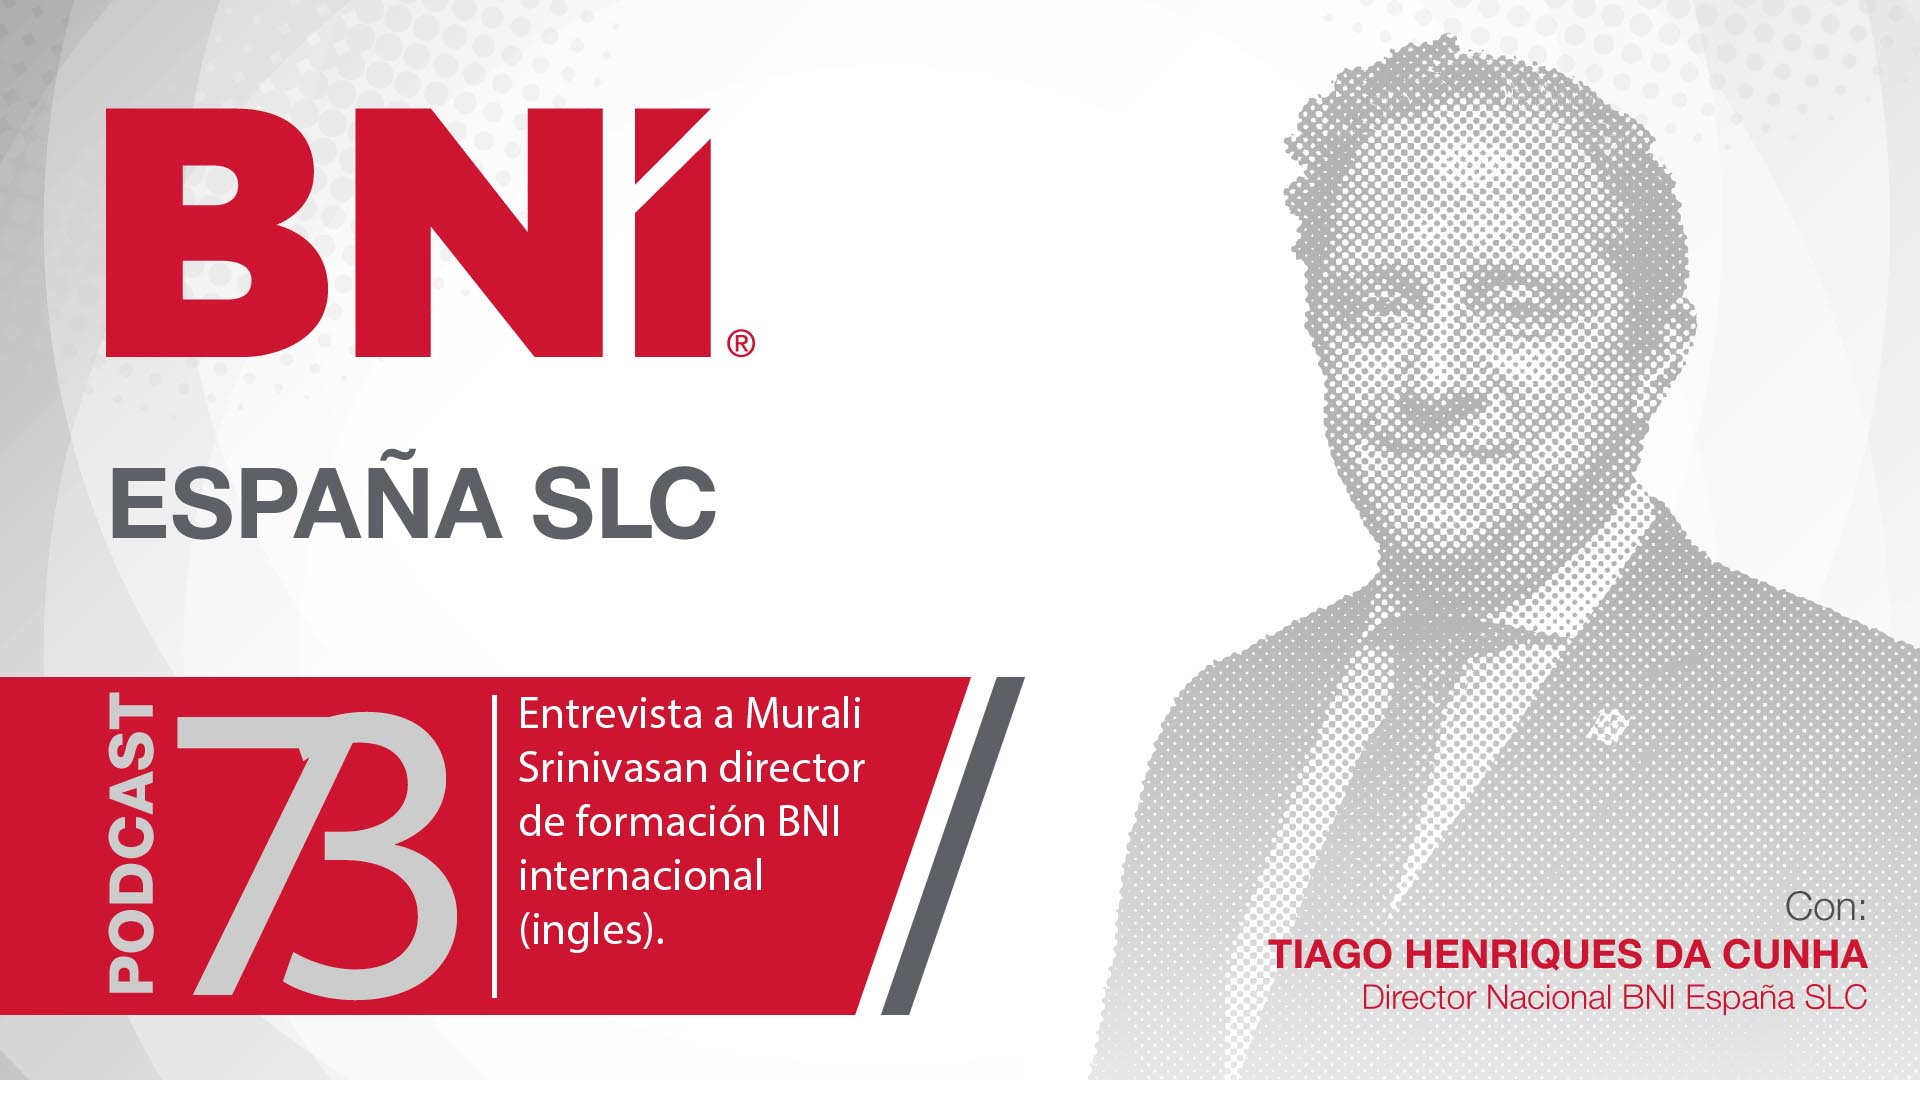 EPISODIO 73 – ENTREVISTA A MURALI SRINIVASAN DIRECTOR DE FORMACION BNI INTERNACIONAL ( inglés sin traducción)